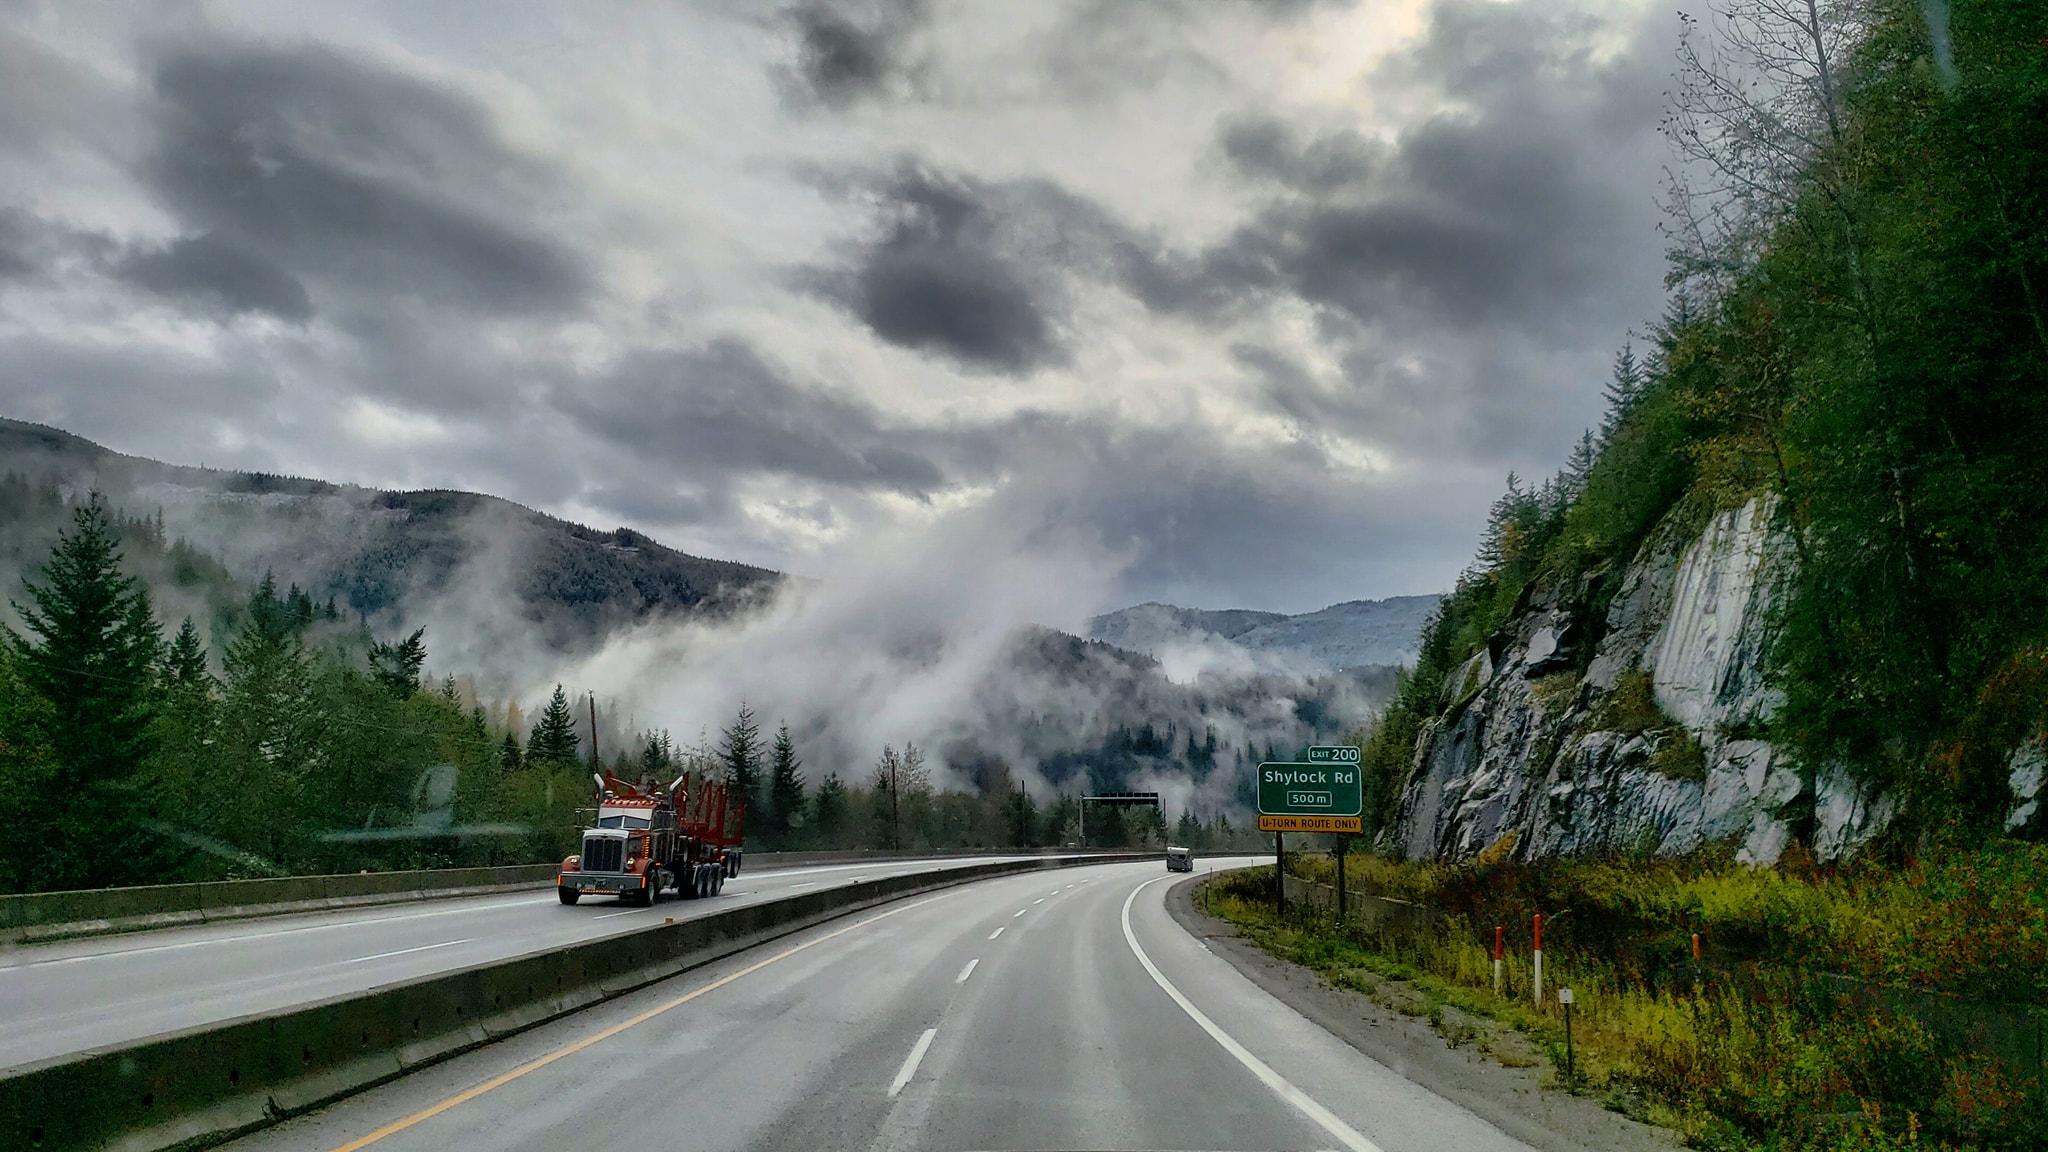 9-10-2019--Hope-Canada-opweg-naar-Vancouver-(6)